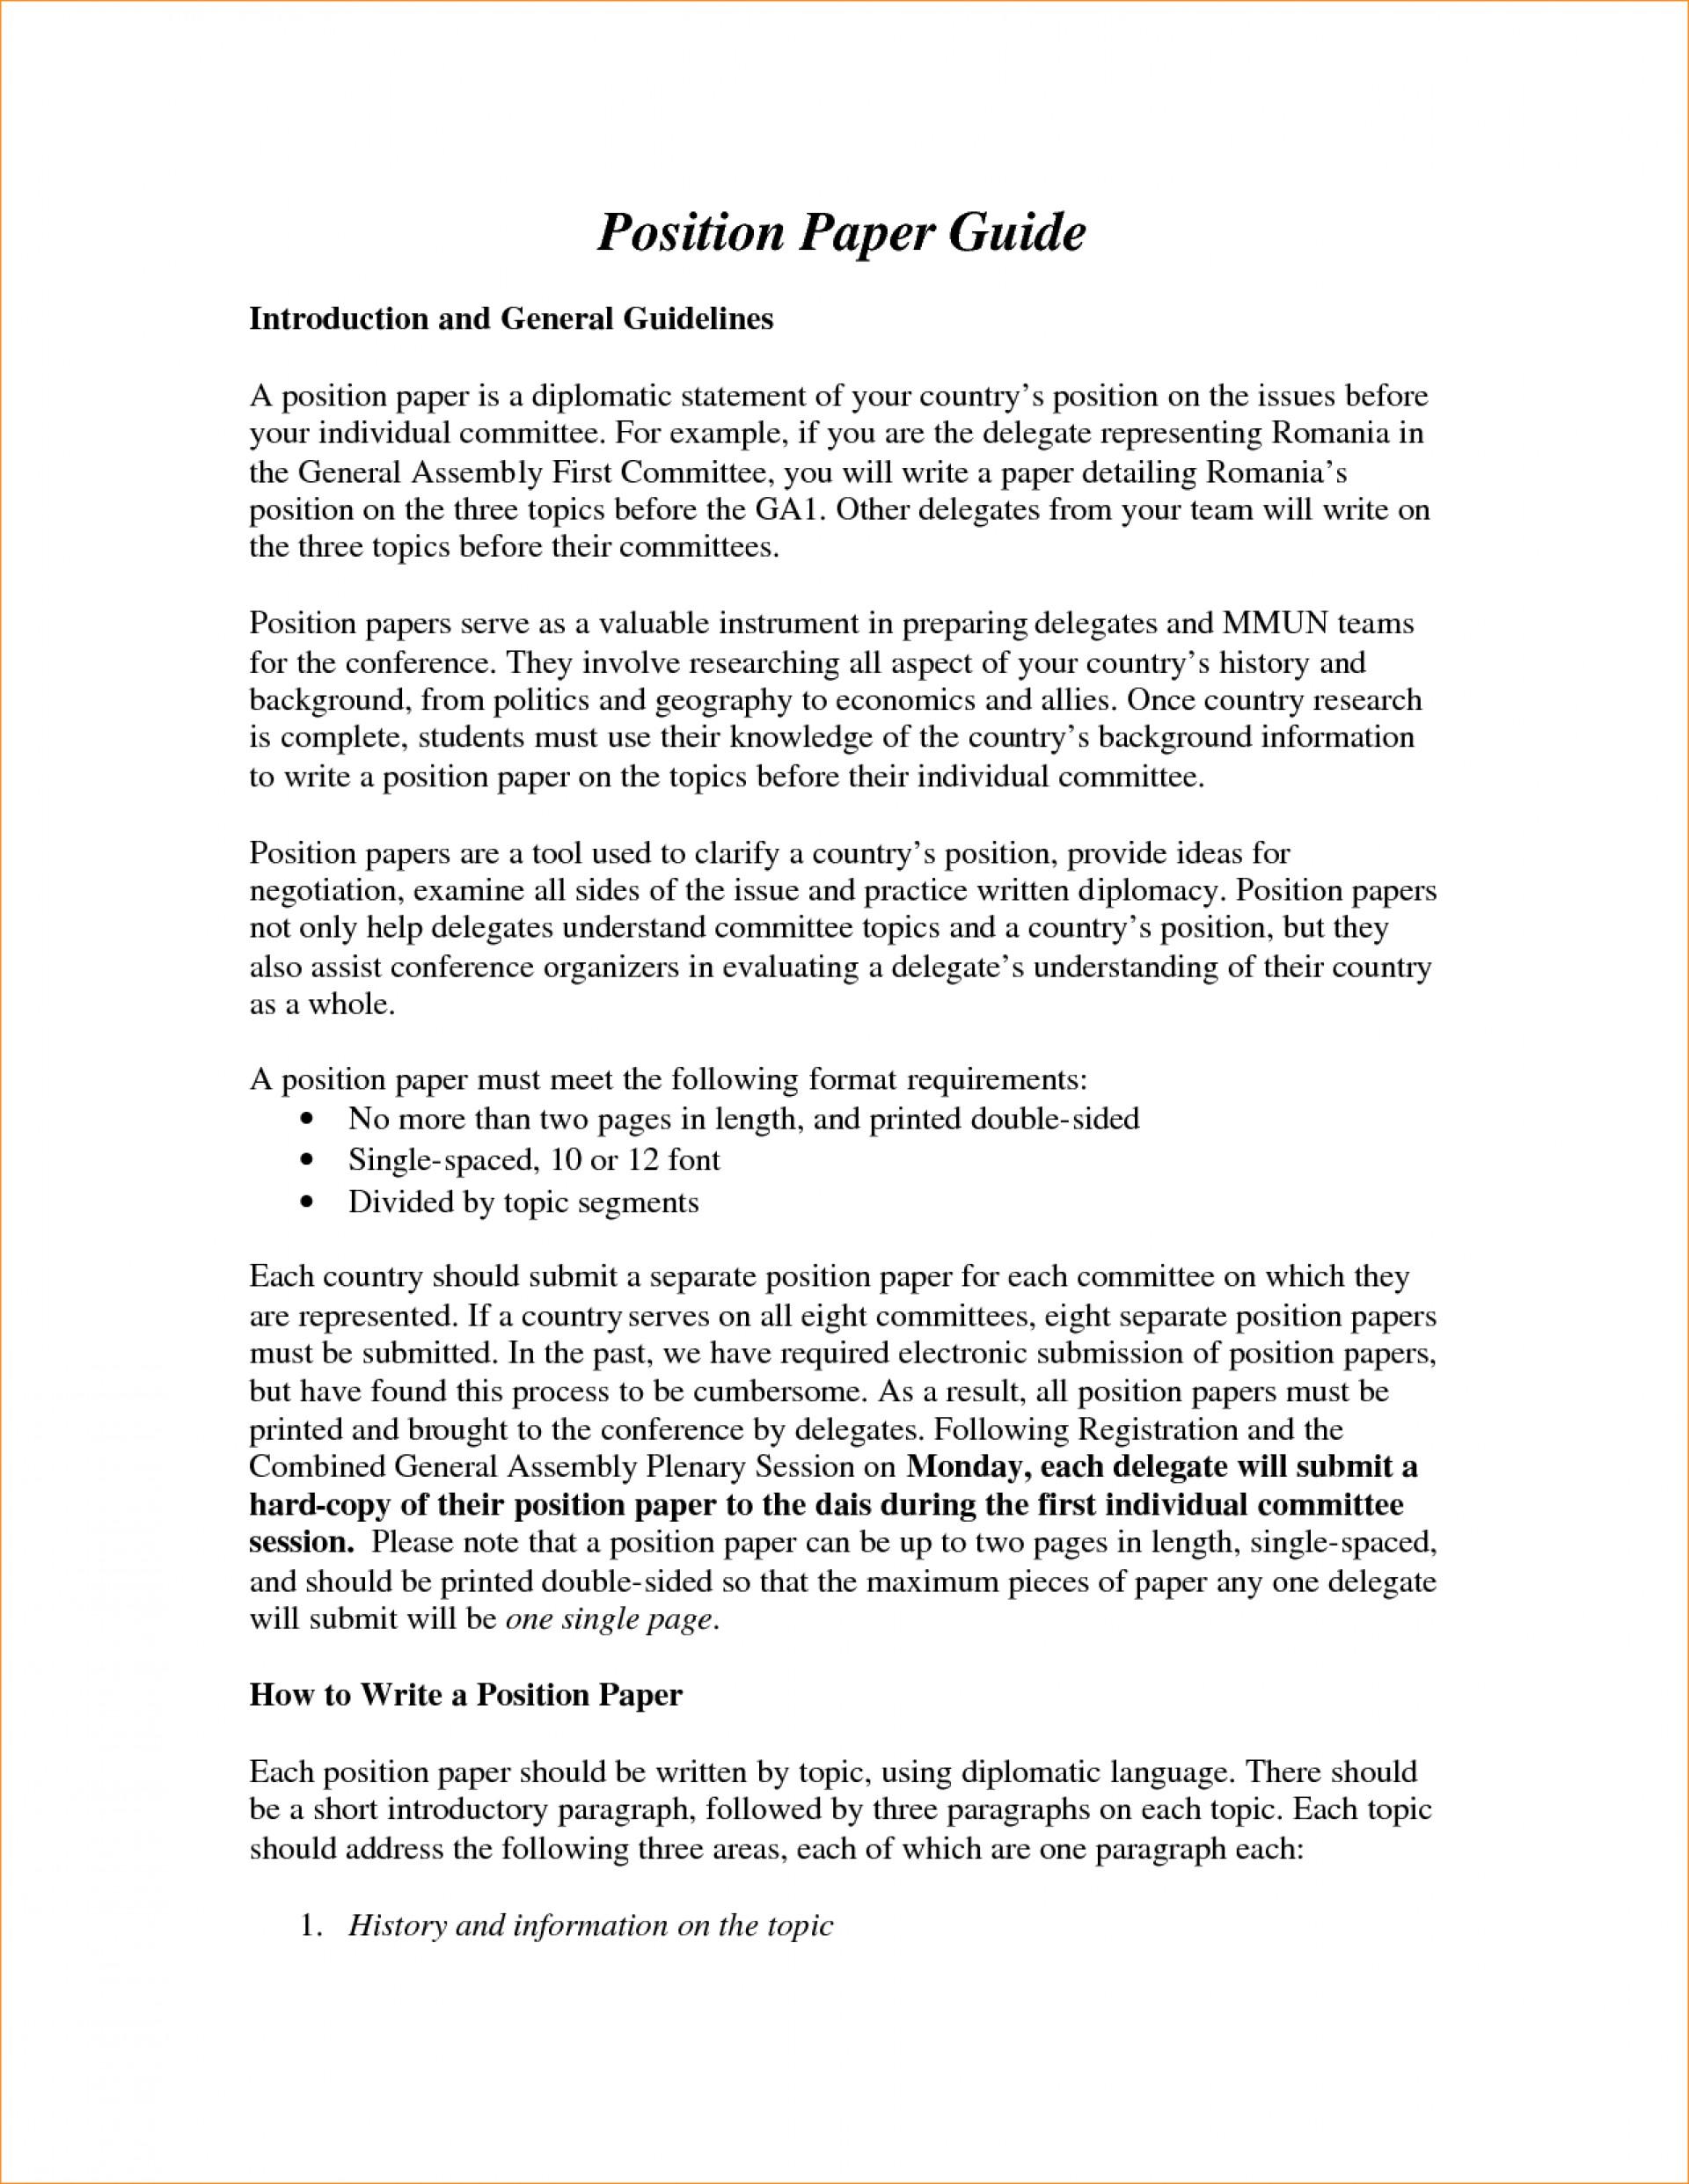 020 English Essay Topics Example Proposal Topic List University Healthy Business How To Write An Nb5h37b5f7xw28ltnfxgk76t4bzg97dp4nqwy8dfnvygyylamvsc766sm7xx4 Dreaded Literature Question Paper For Class 10 Icse 2015 Maharashtra Board 1920